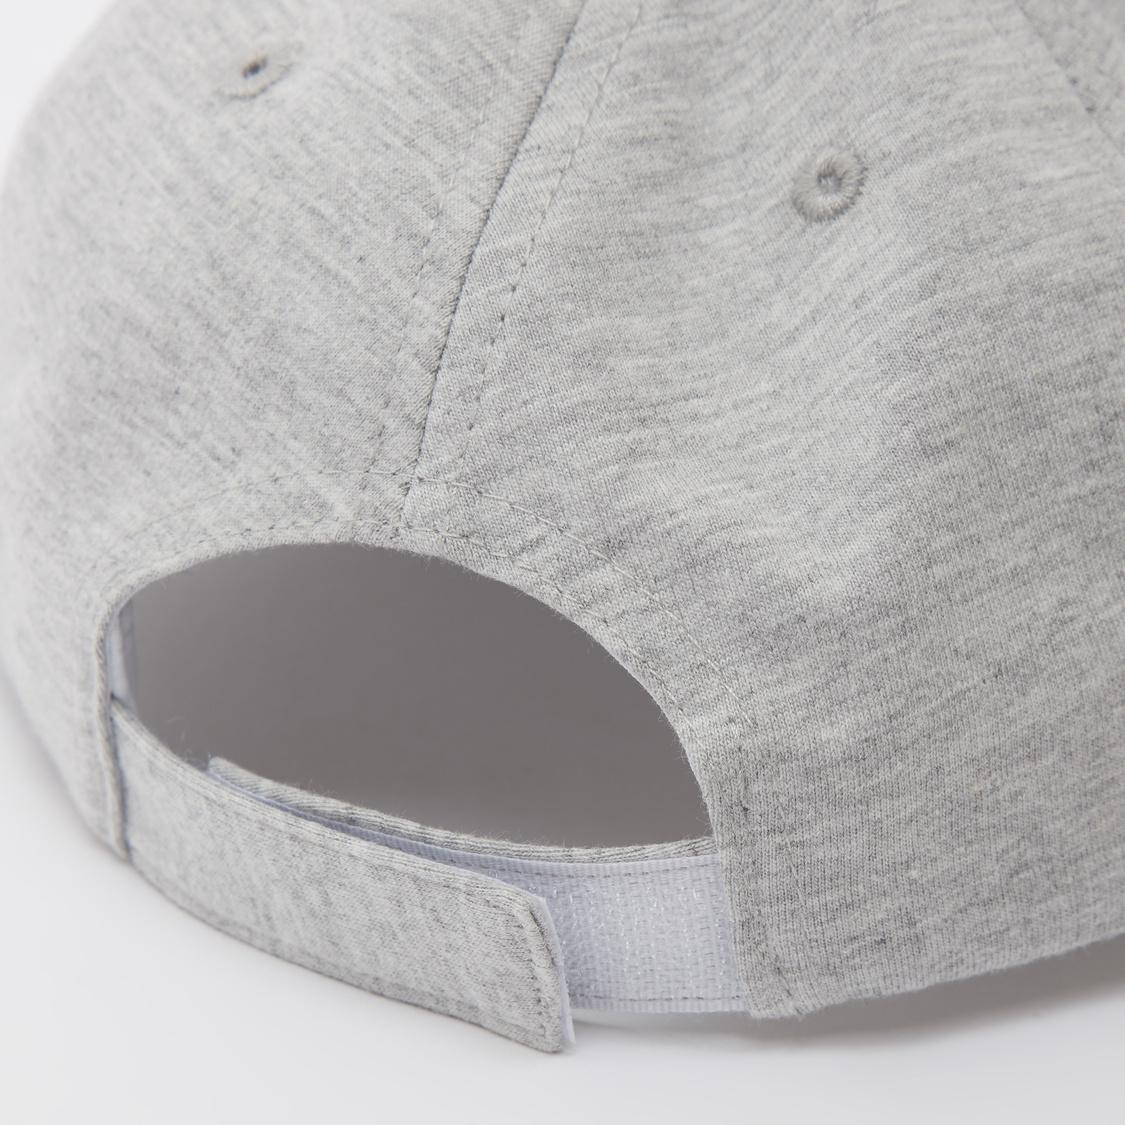 Reversible Sequin Detail Cap with Hook and Loop Closure